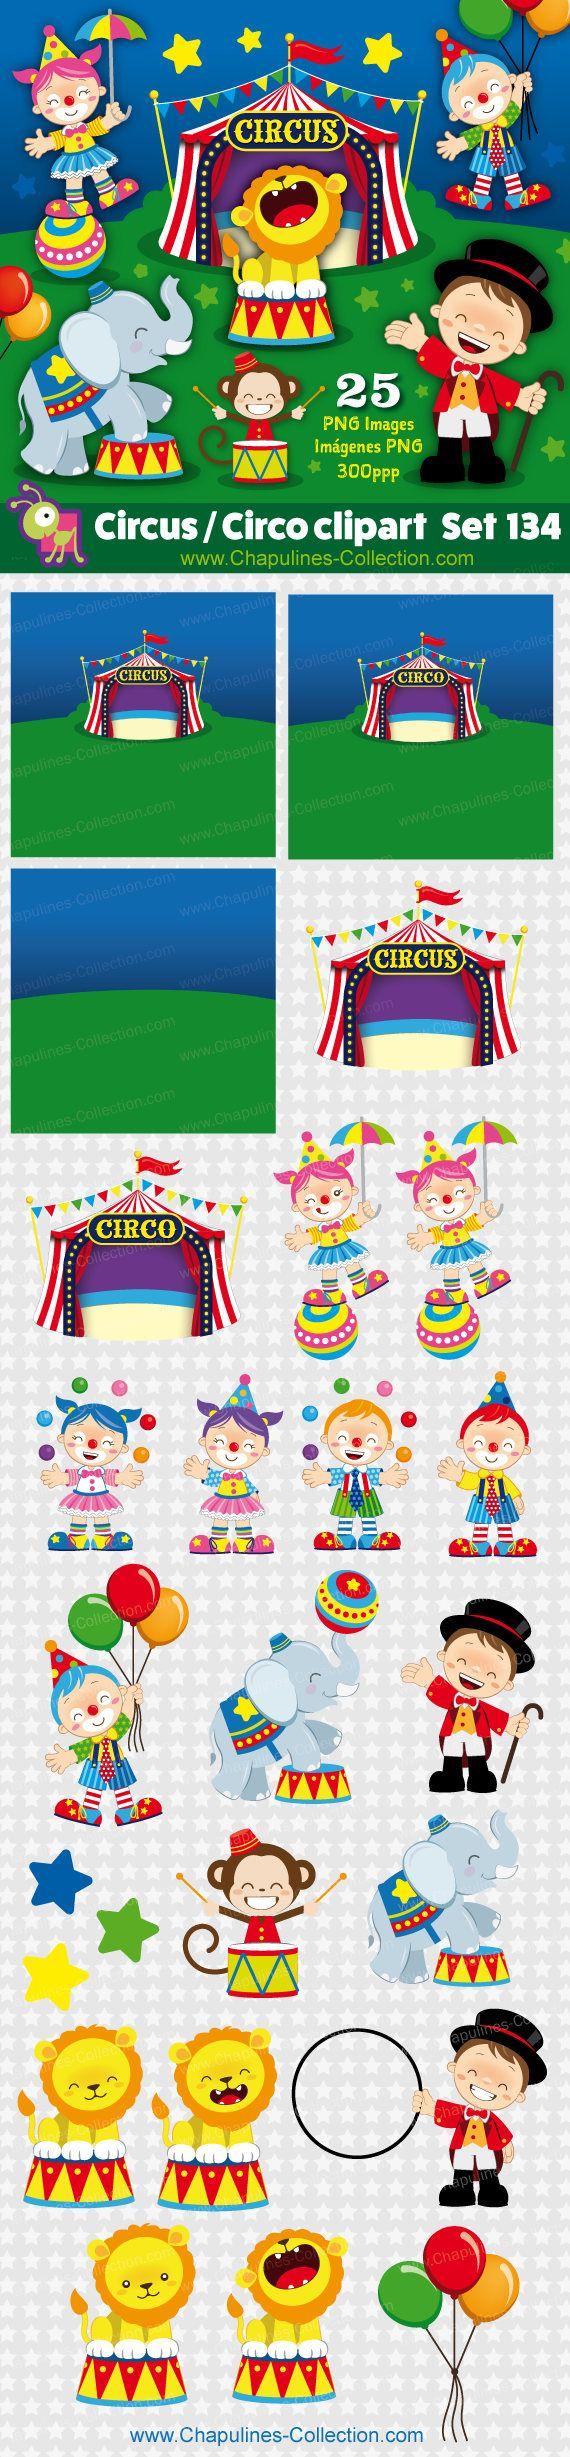 Circus clipart clown elephant monkey lion balloons